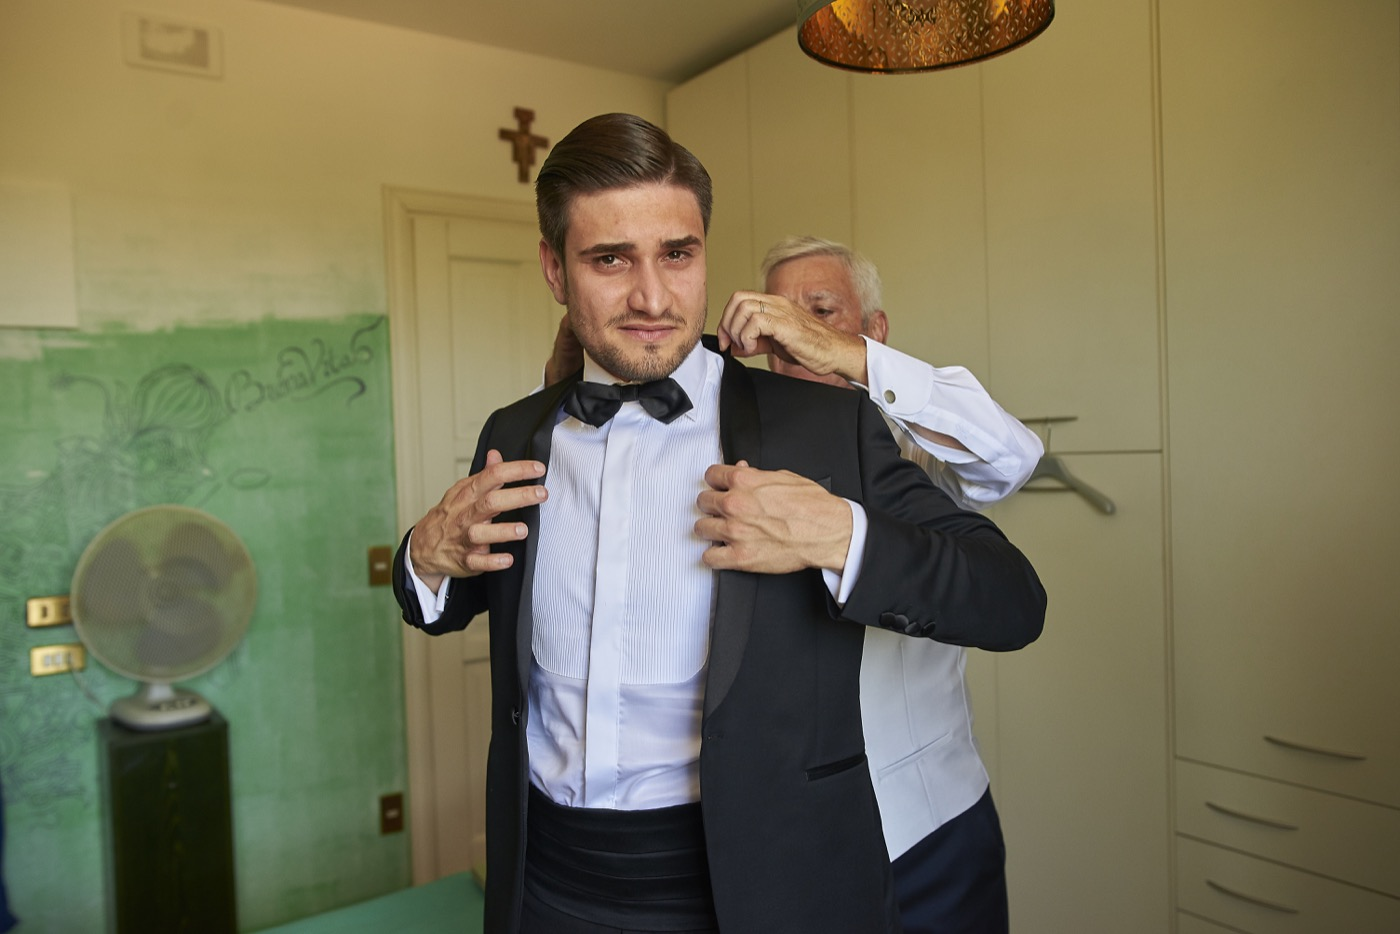 Claudio-Coppola-wedding-photographer-abbazia-7-frati-piegaro-16